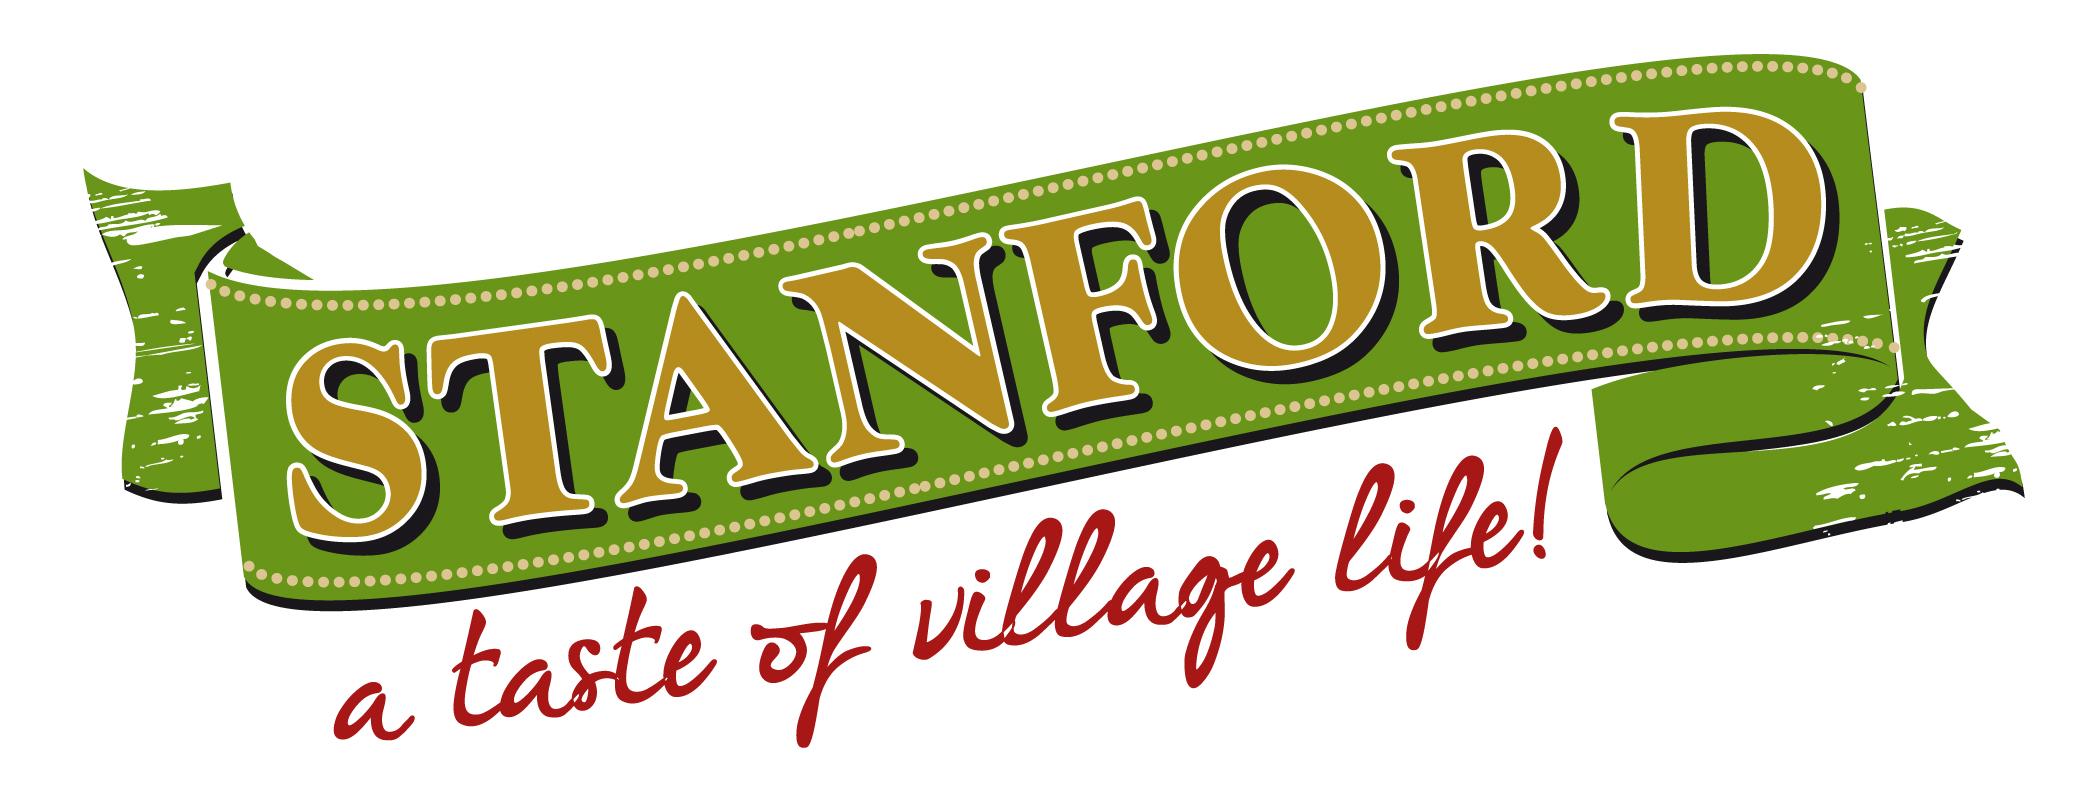 https://kleinmondtourism.co.za/wp-content/uploads/2020/09/logo-a-taste-village-life.jpg